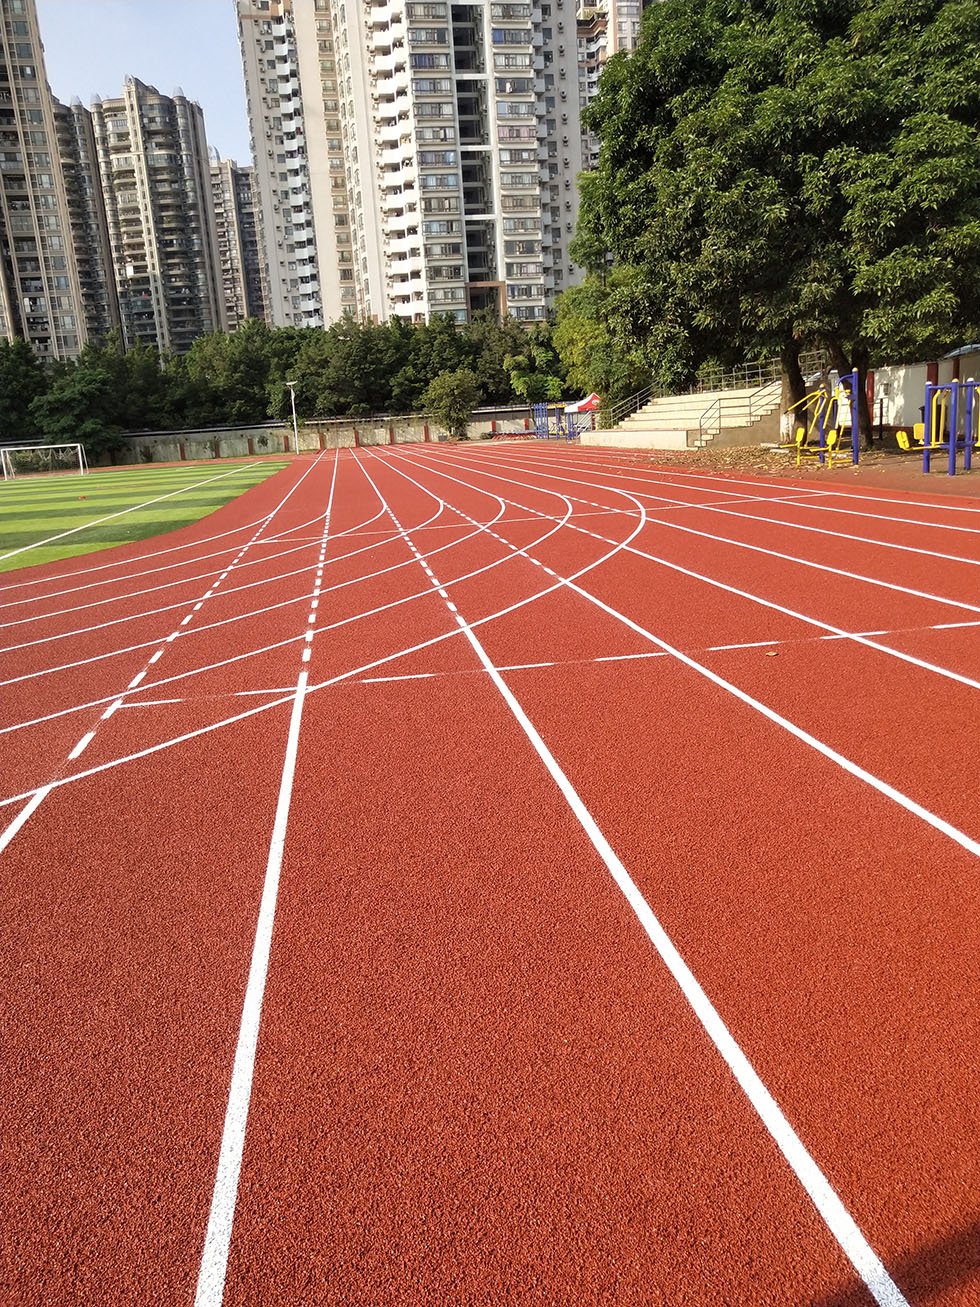 EPDM学校塑胶跑道相比一般跑道的优势在哪里